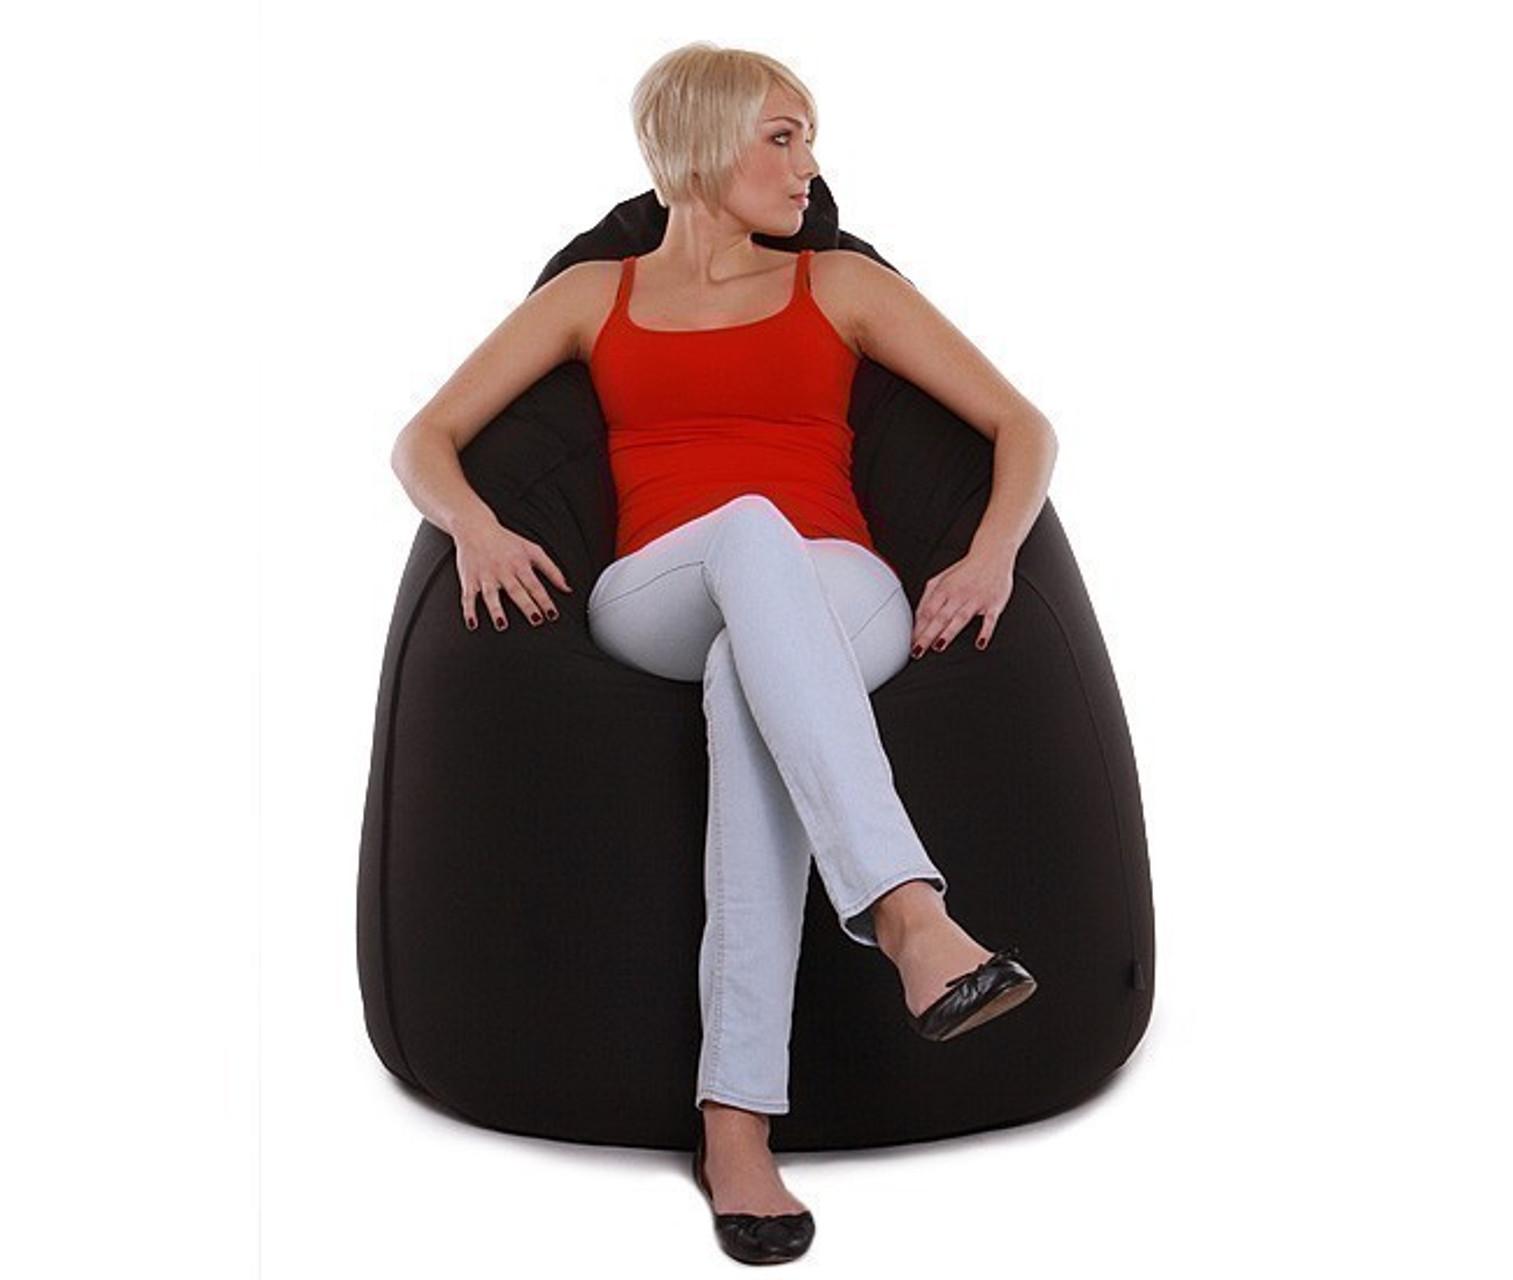 re bax jumbo xl sitzsack mit leder bezug rustik gr e ca 135cm durchmesser ca 90cm. Black Bedroom Furniture Sets. Home Design Ideas